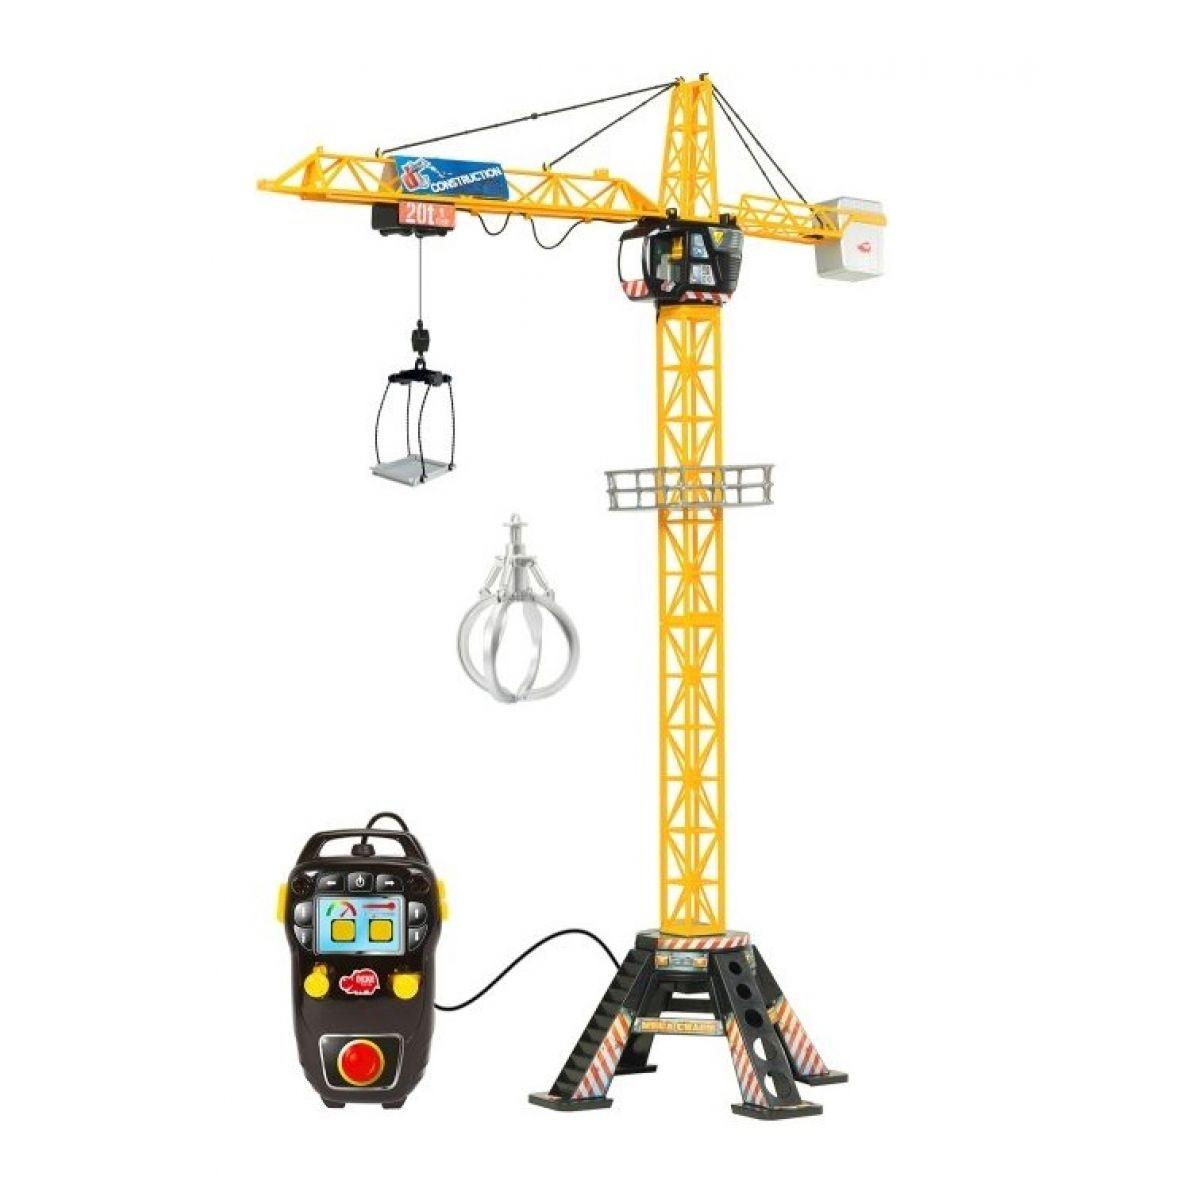 Dickie Jeřáb Mega Crane na kabel 120 cm